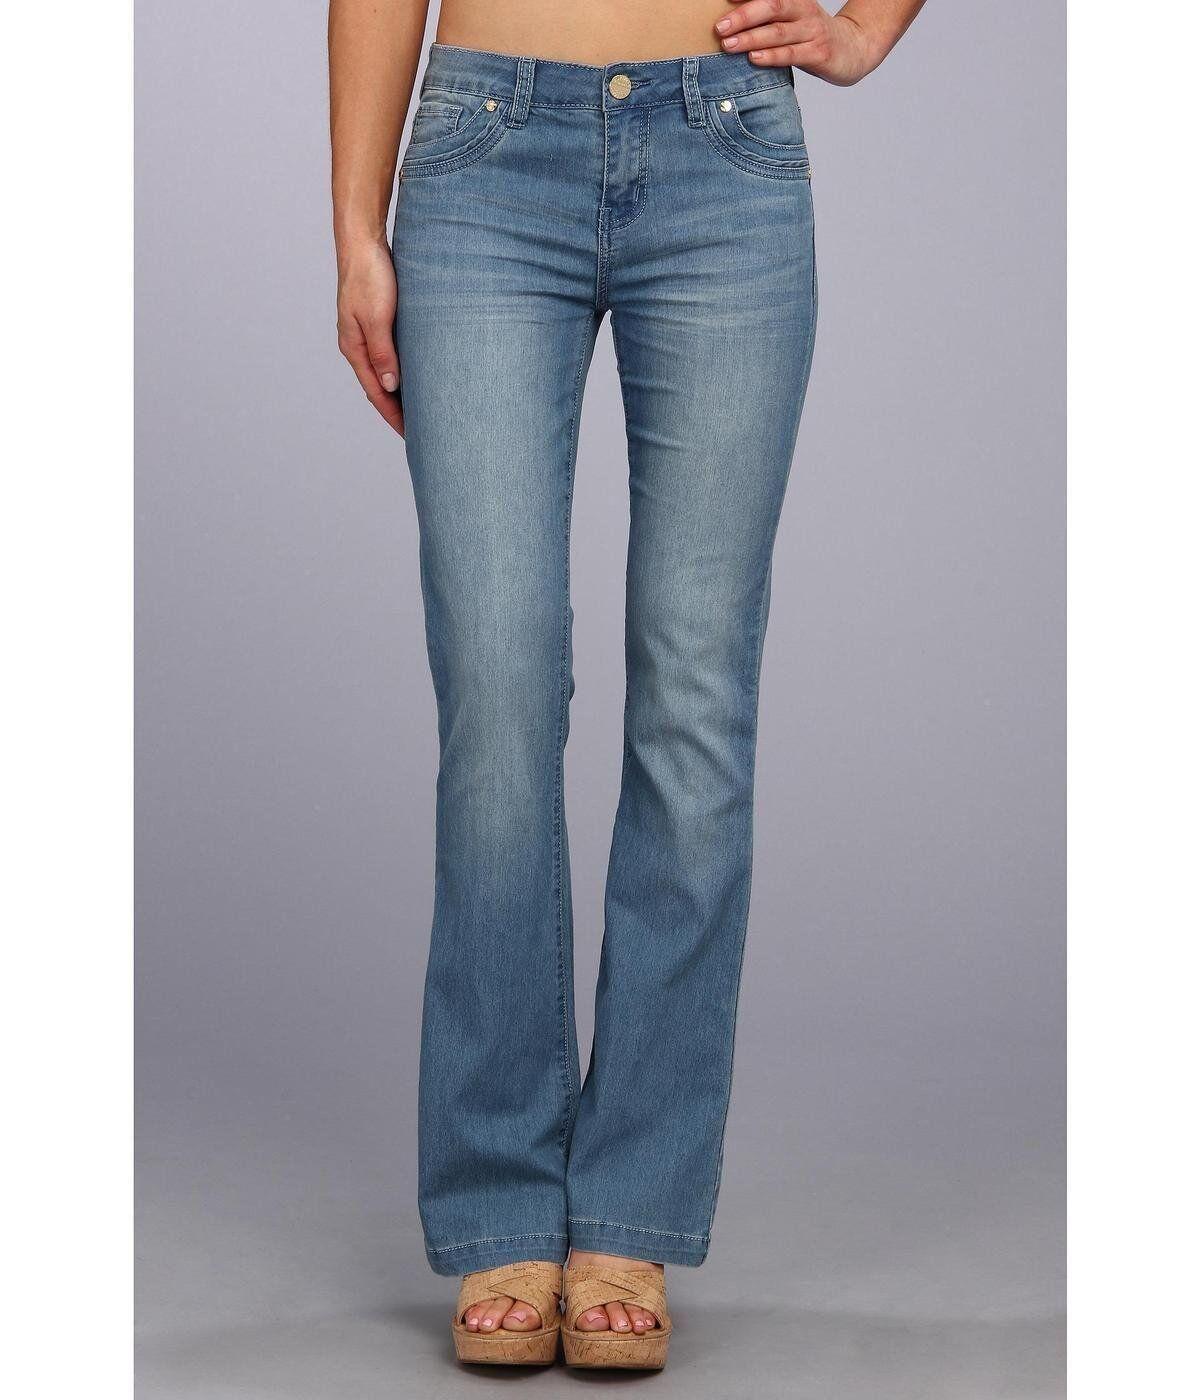 Buffalo David Bitton 'Ferria' Mid-Rise Flare Jeans in Sky Wash Sz 29 stretch New